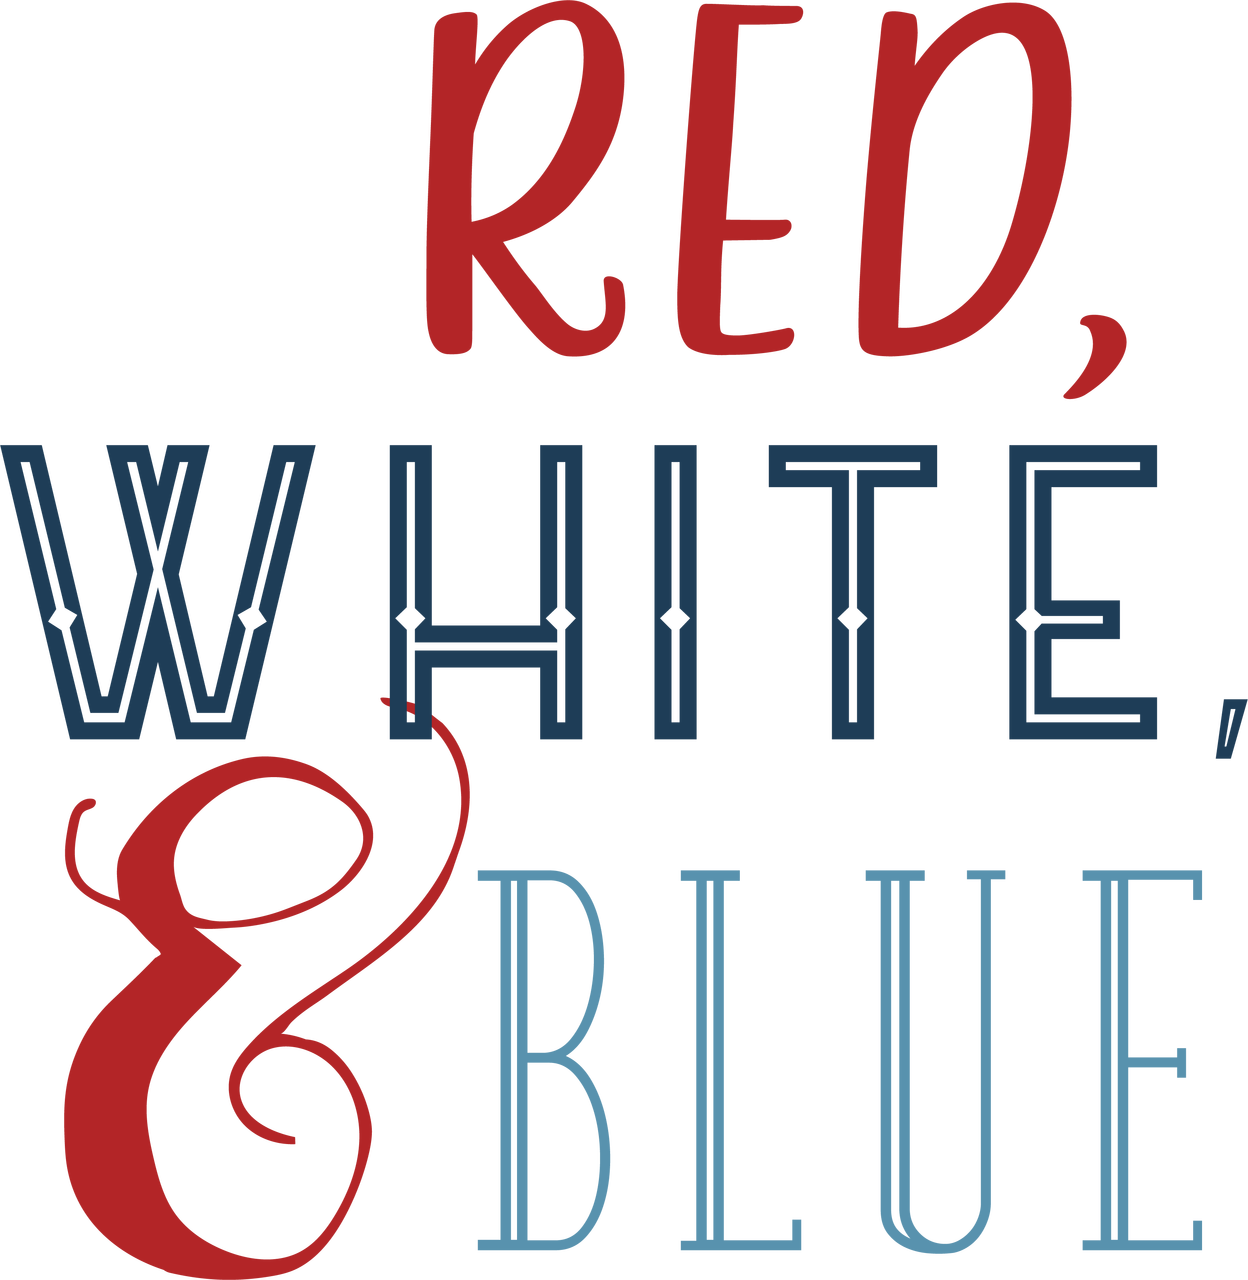 Red, White, & Blue SVG Cut File